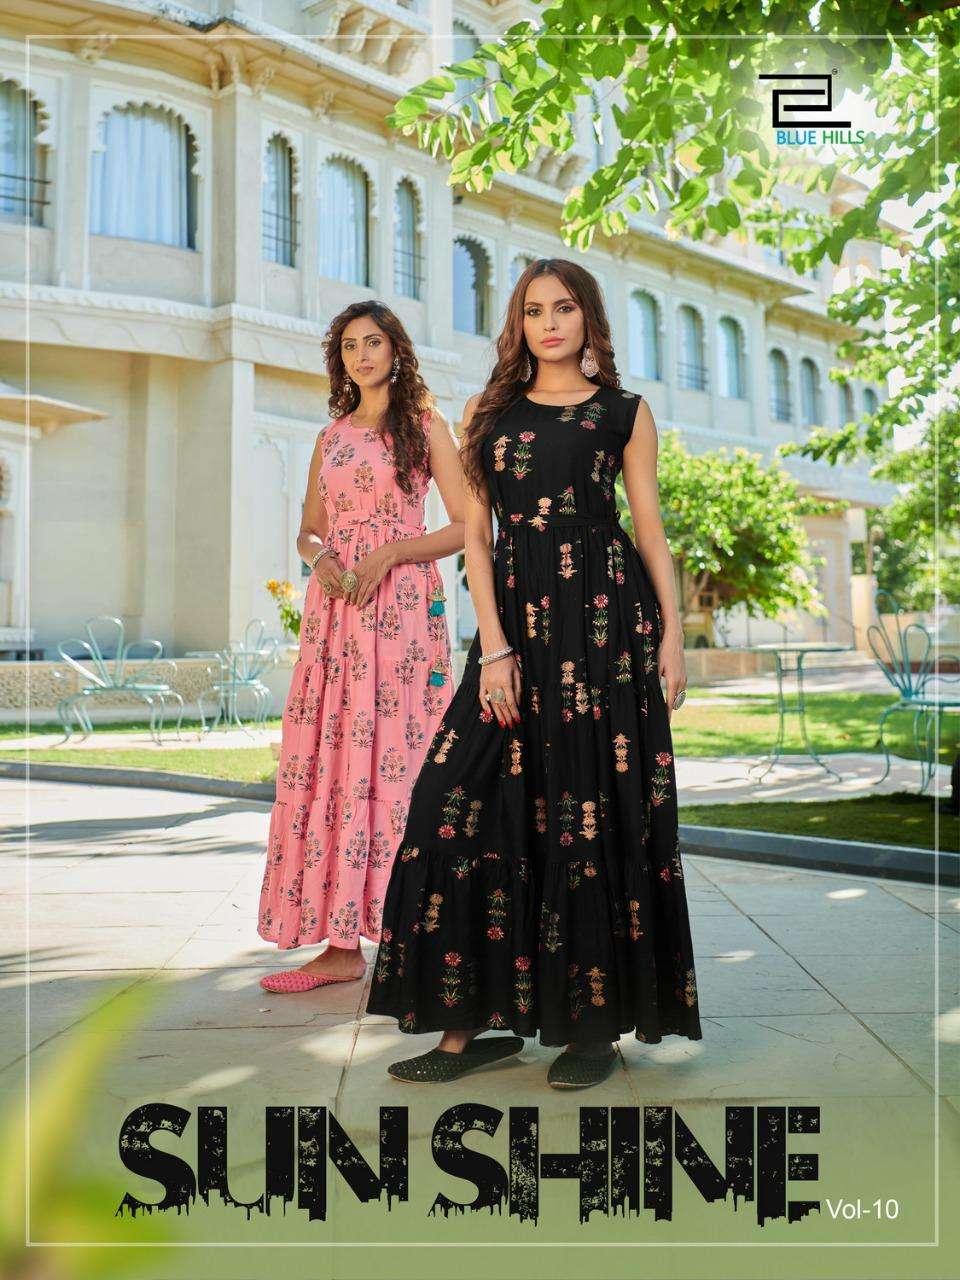 Blue Hills Sunshine Vol 10 Rayon Big Sizes Long Gowns